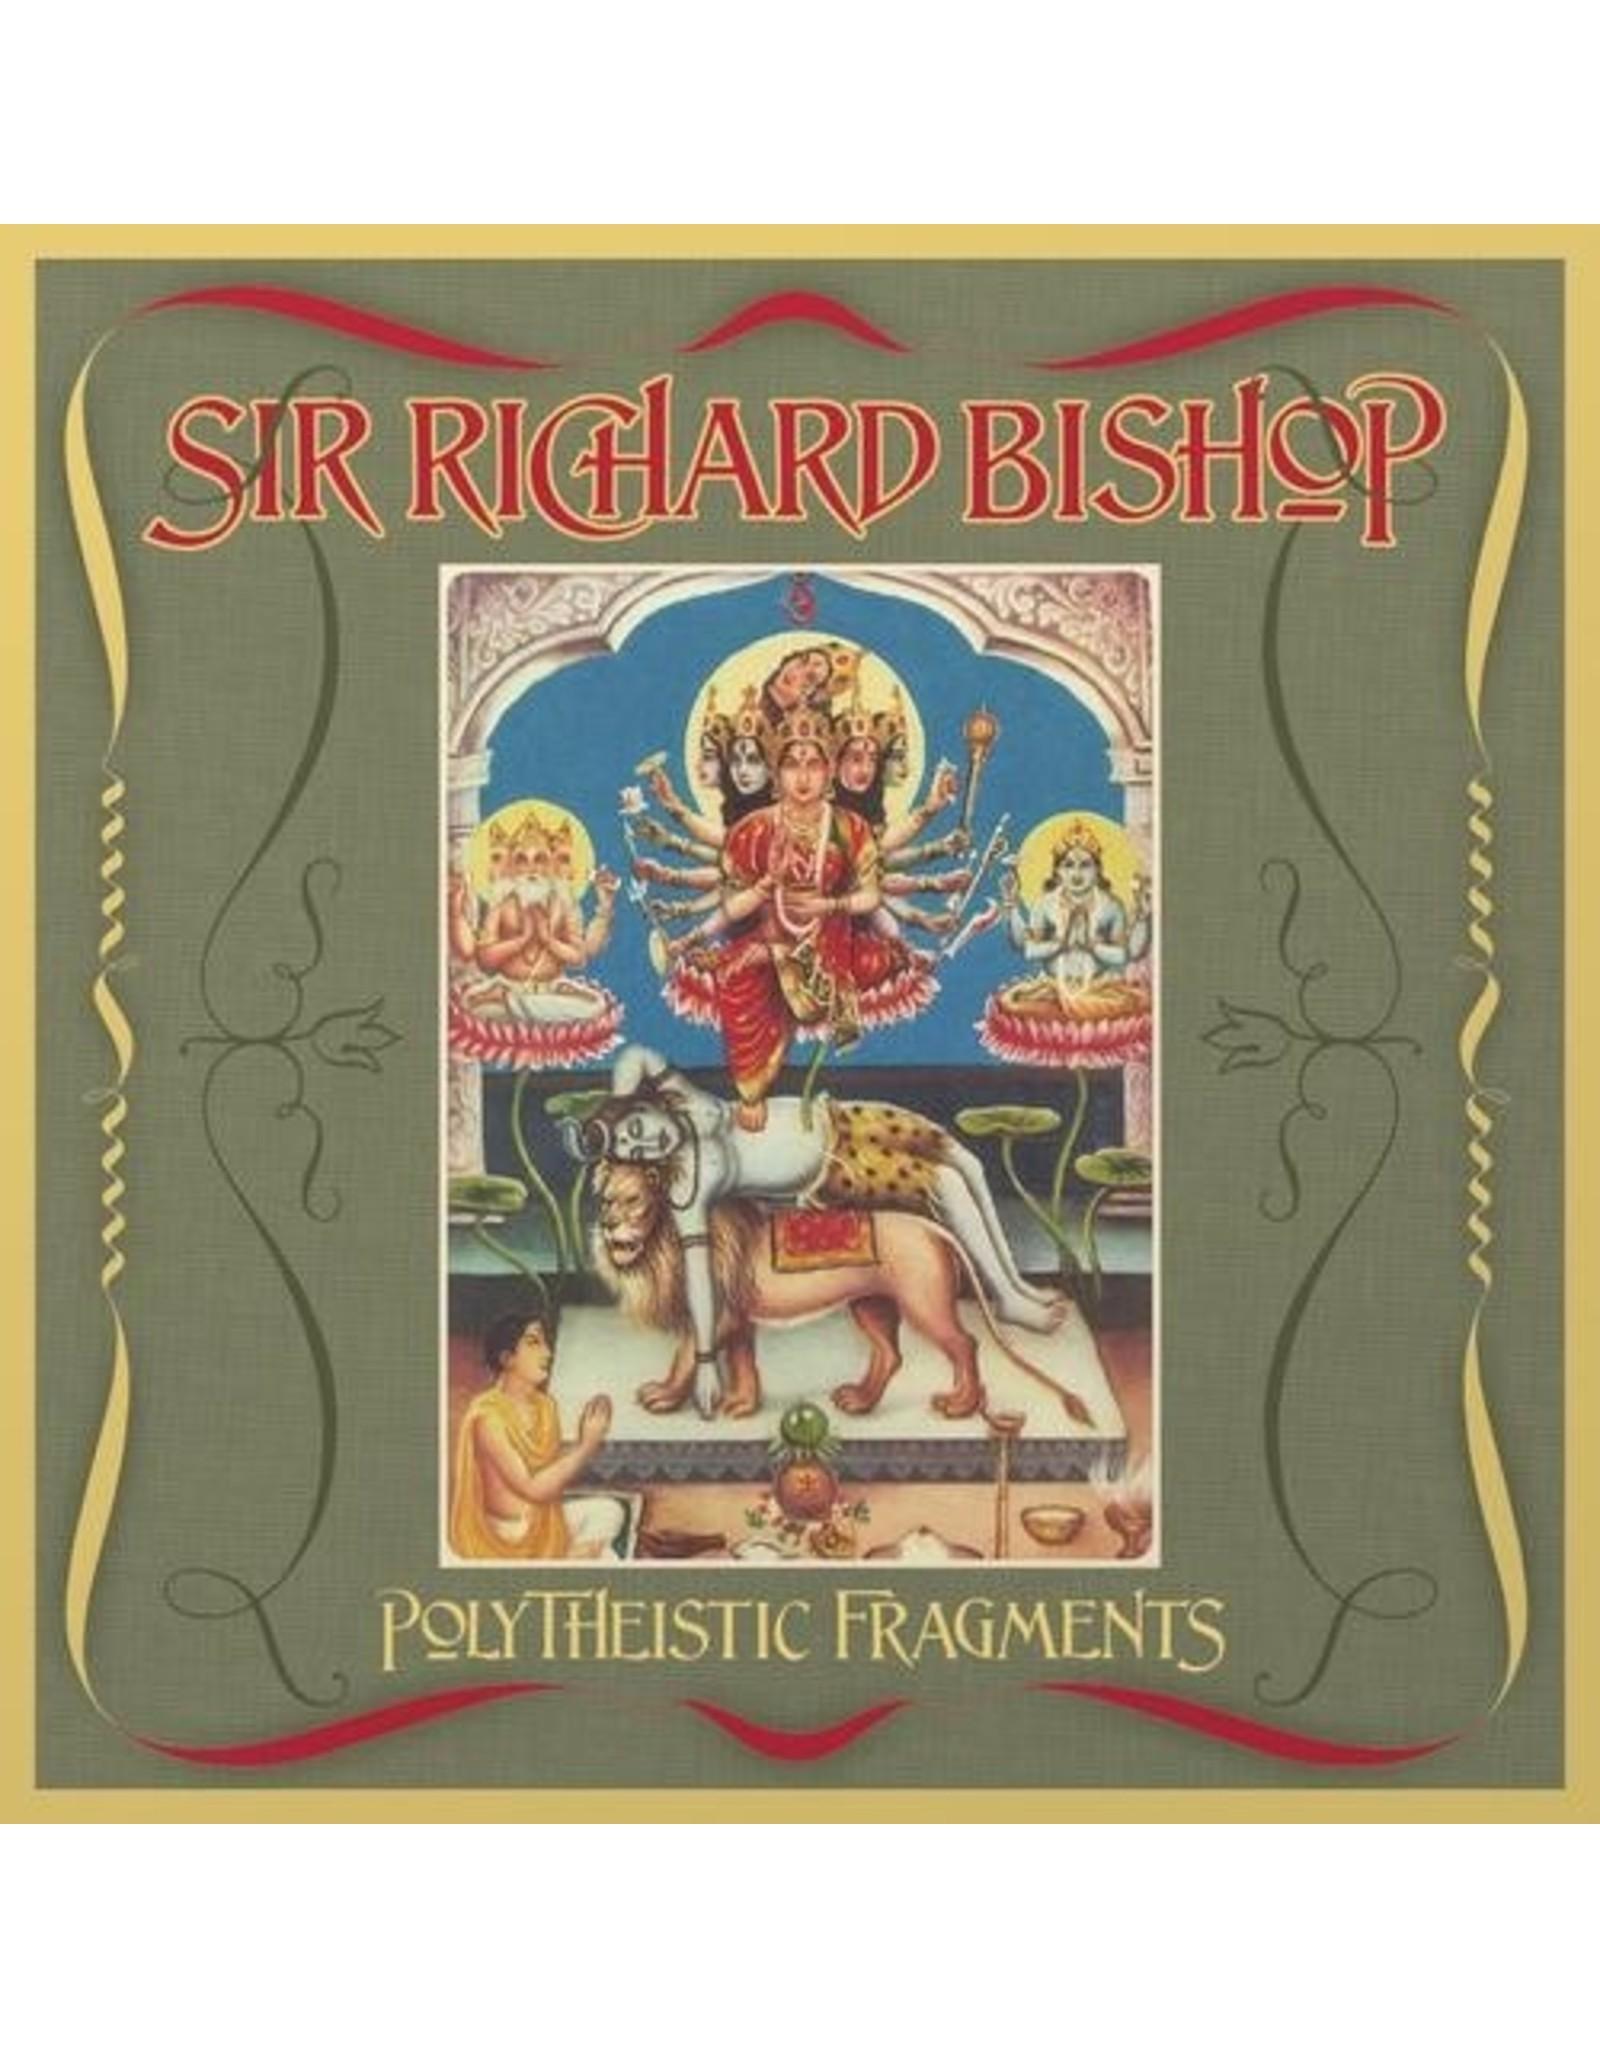 New Vinyl Sir Richard Bishop - Polytheistic Fragments LP